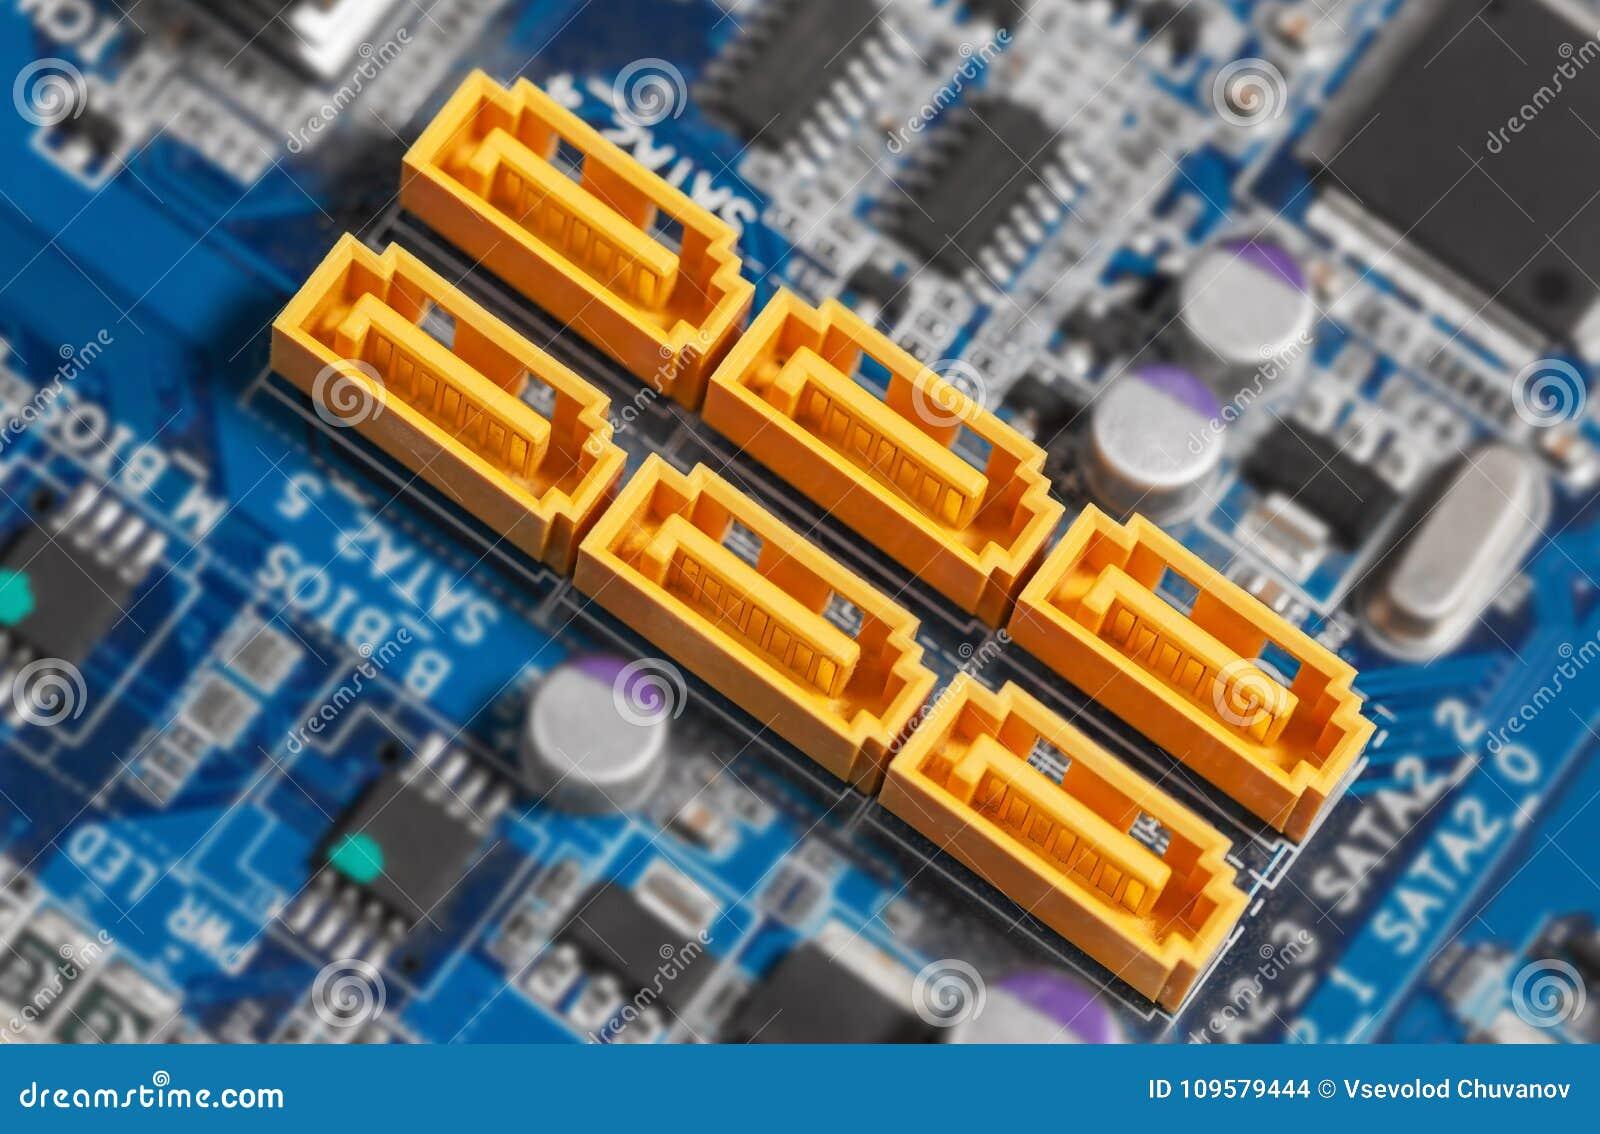 7 Pin Sata Connectors On Motherboard: Motherboard SATA Connectors. Focus On SATA Stock Photo